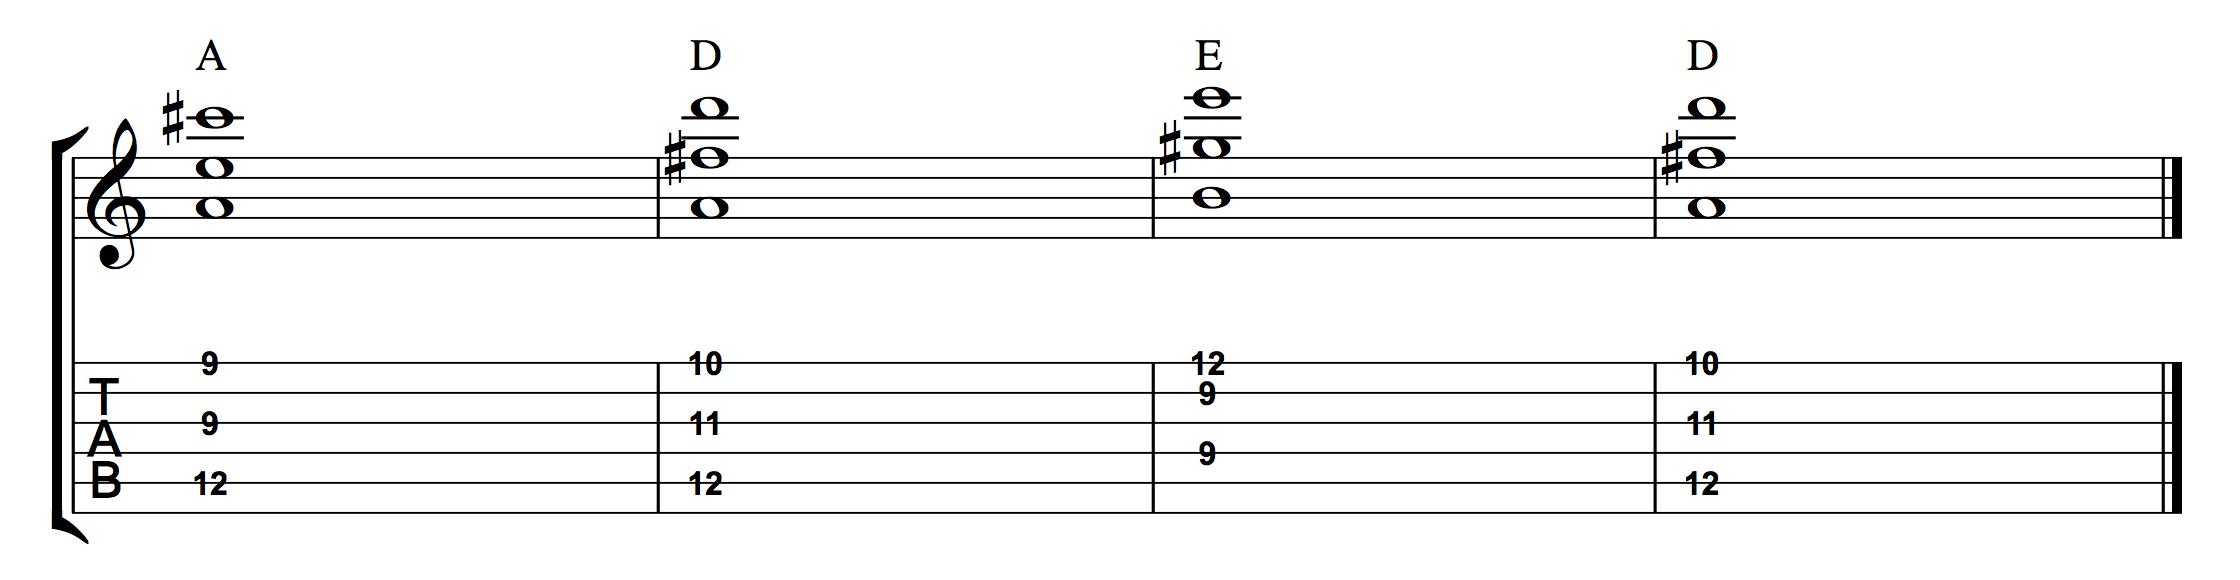 Chord Progression Example 2